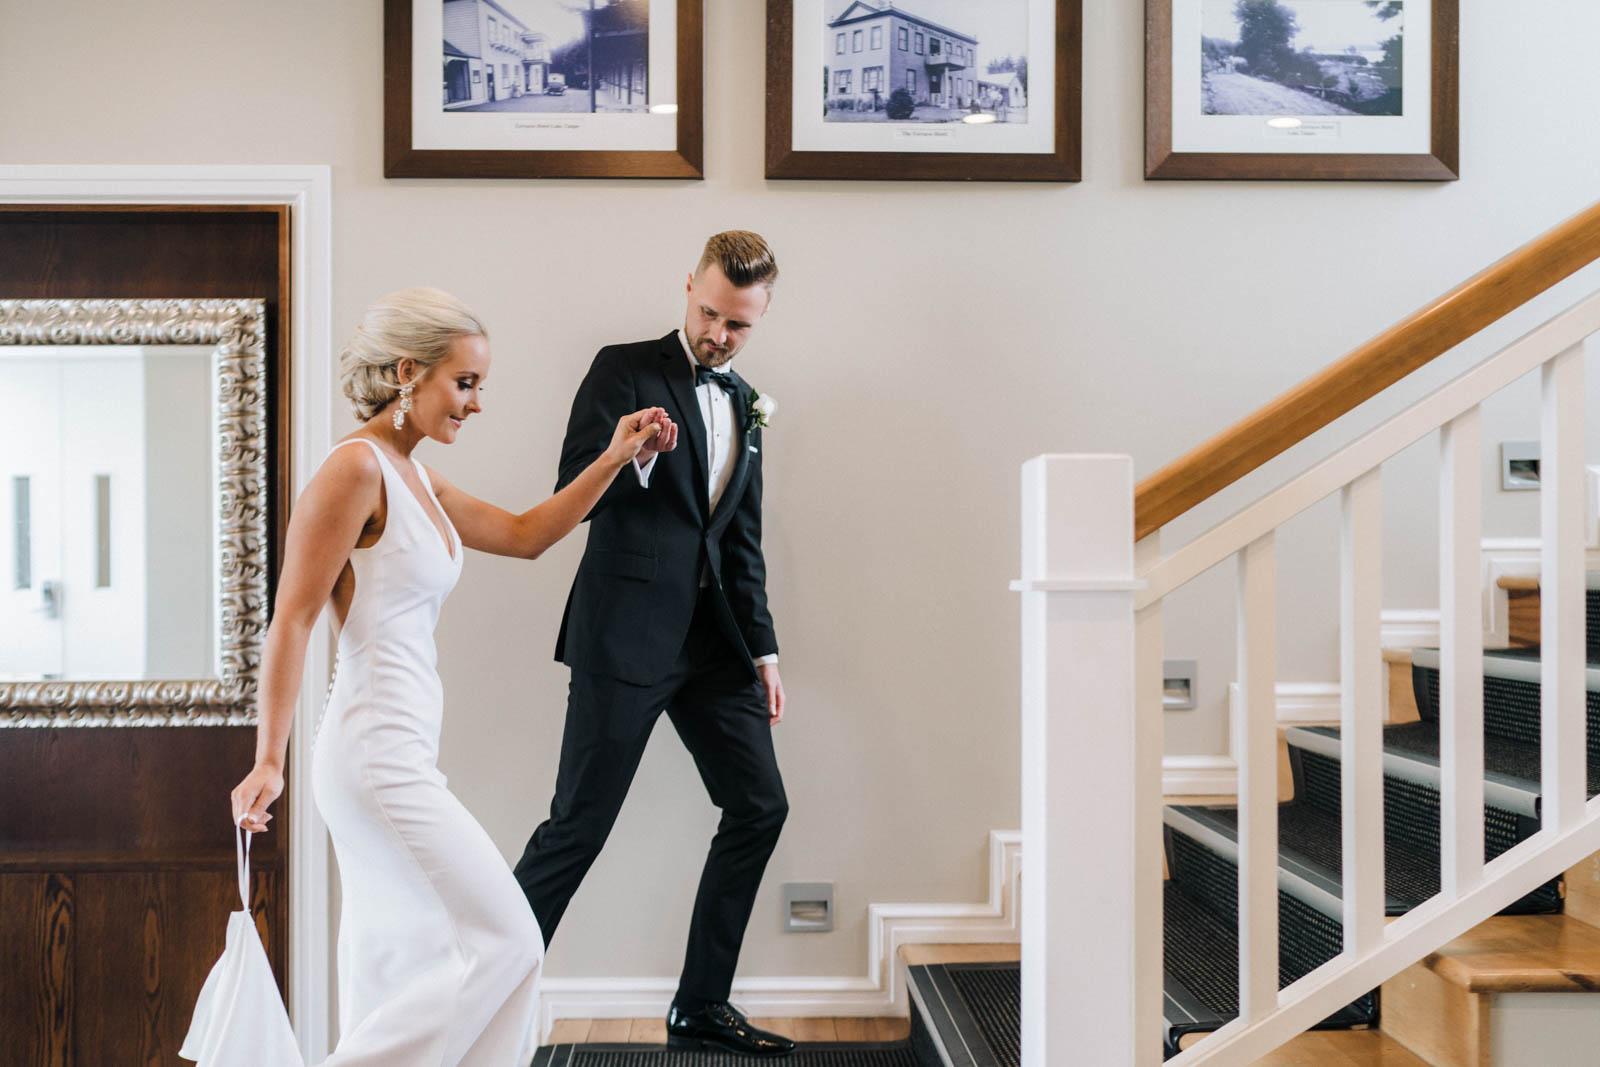 newfound-k-s-hilton-taupo-wedding-photographer-024